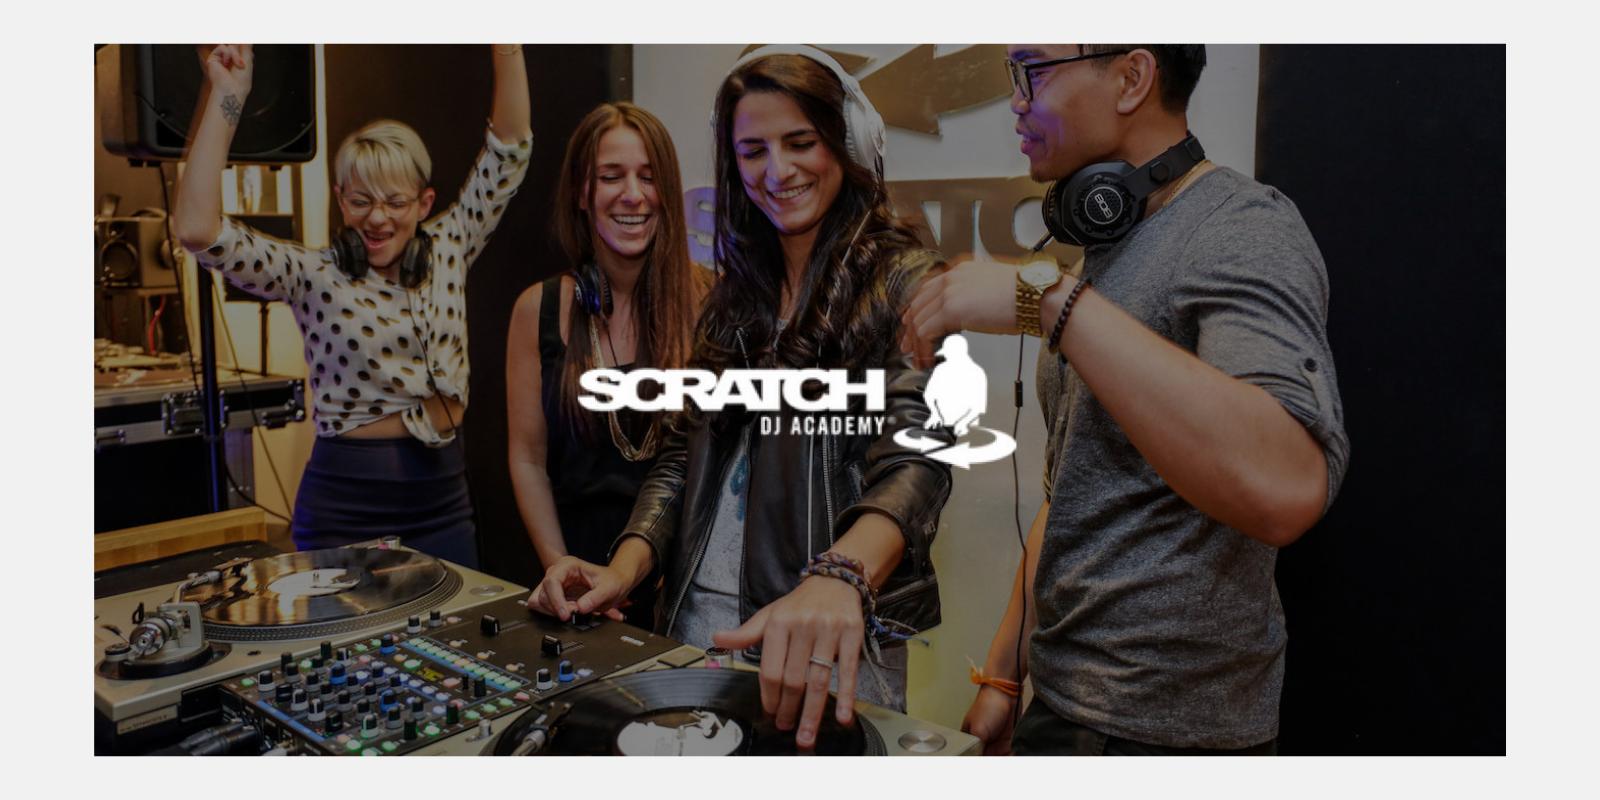 Scratch DJ Academy Spree Commerce Success Story